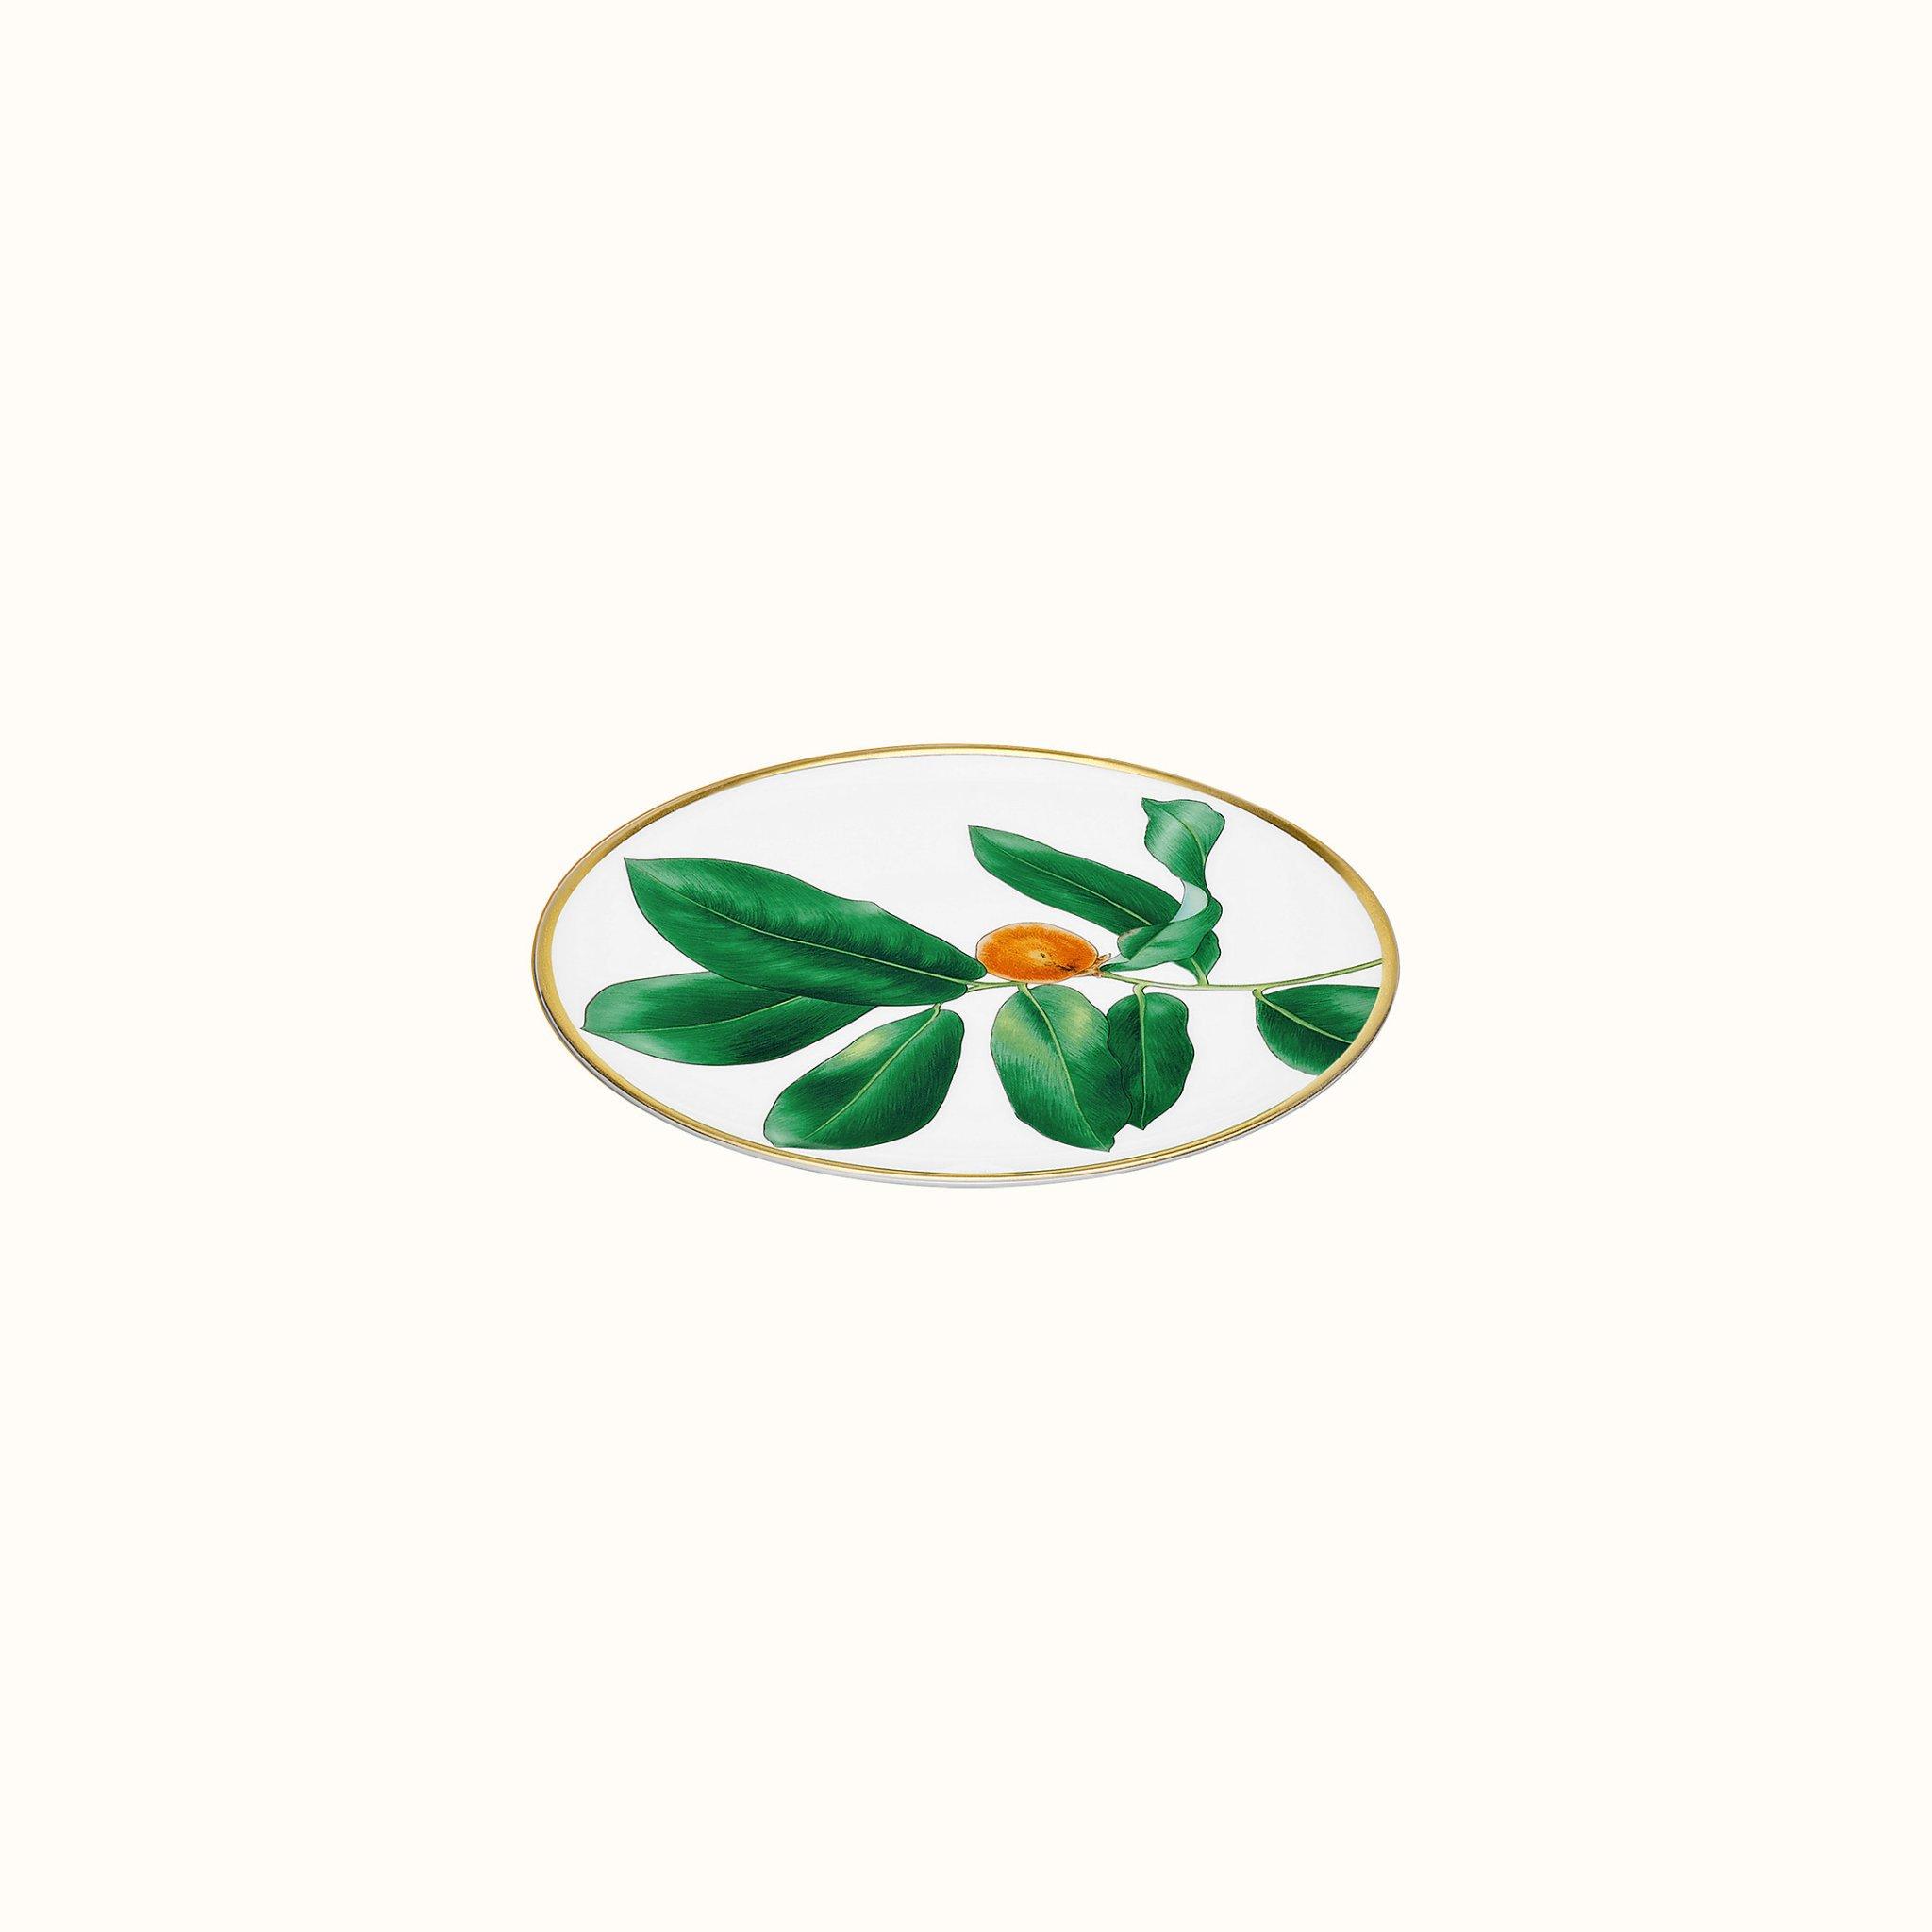 Hermes Passifolia Bread & Butter Plate Kalos No 2